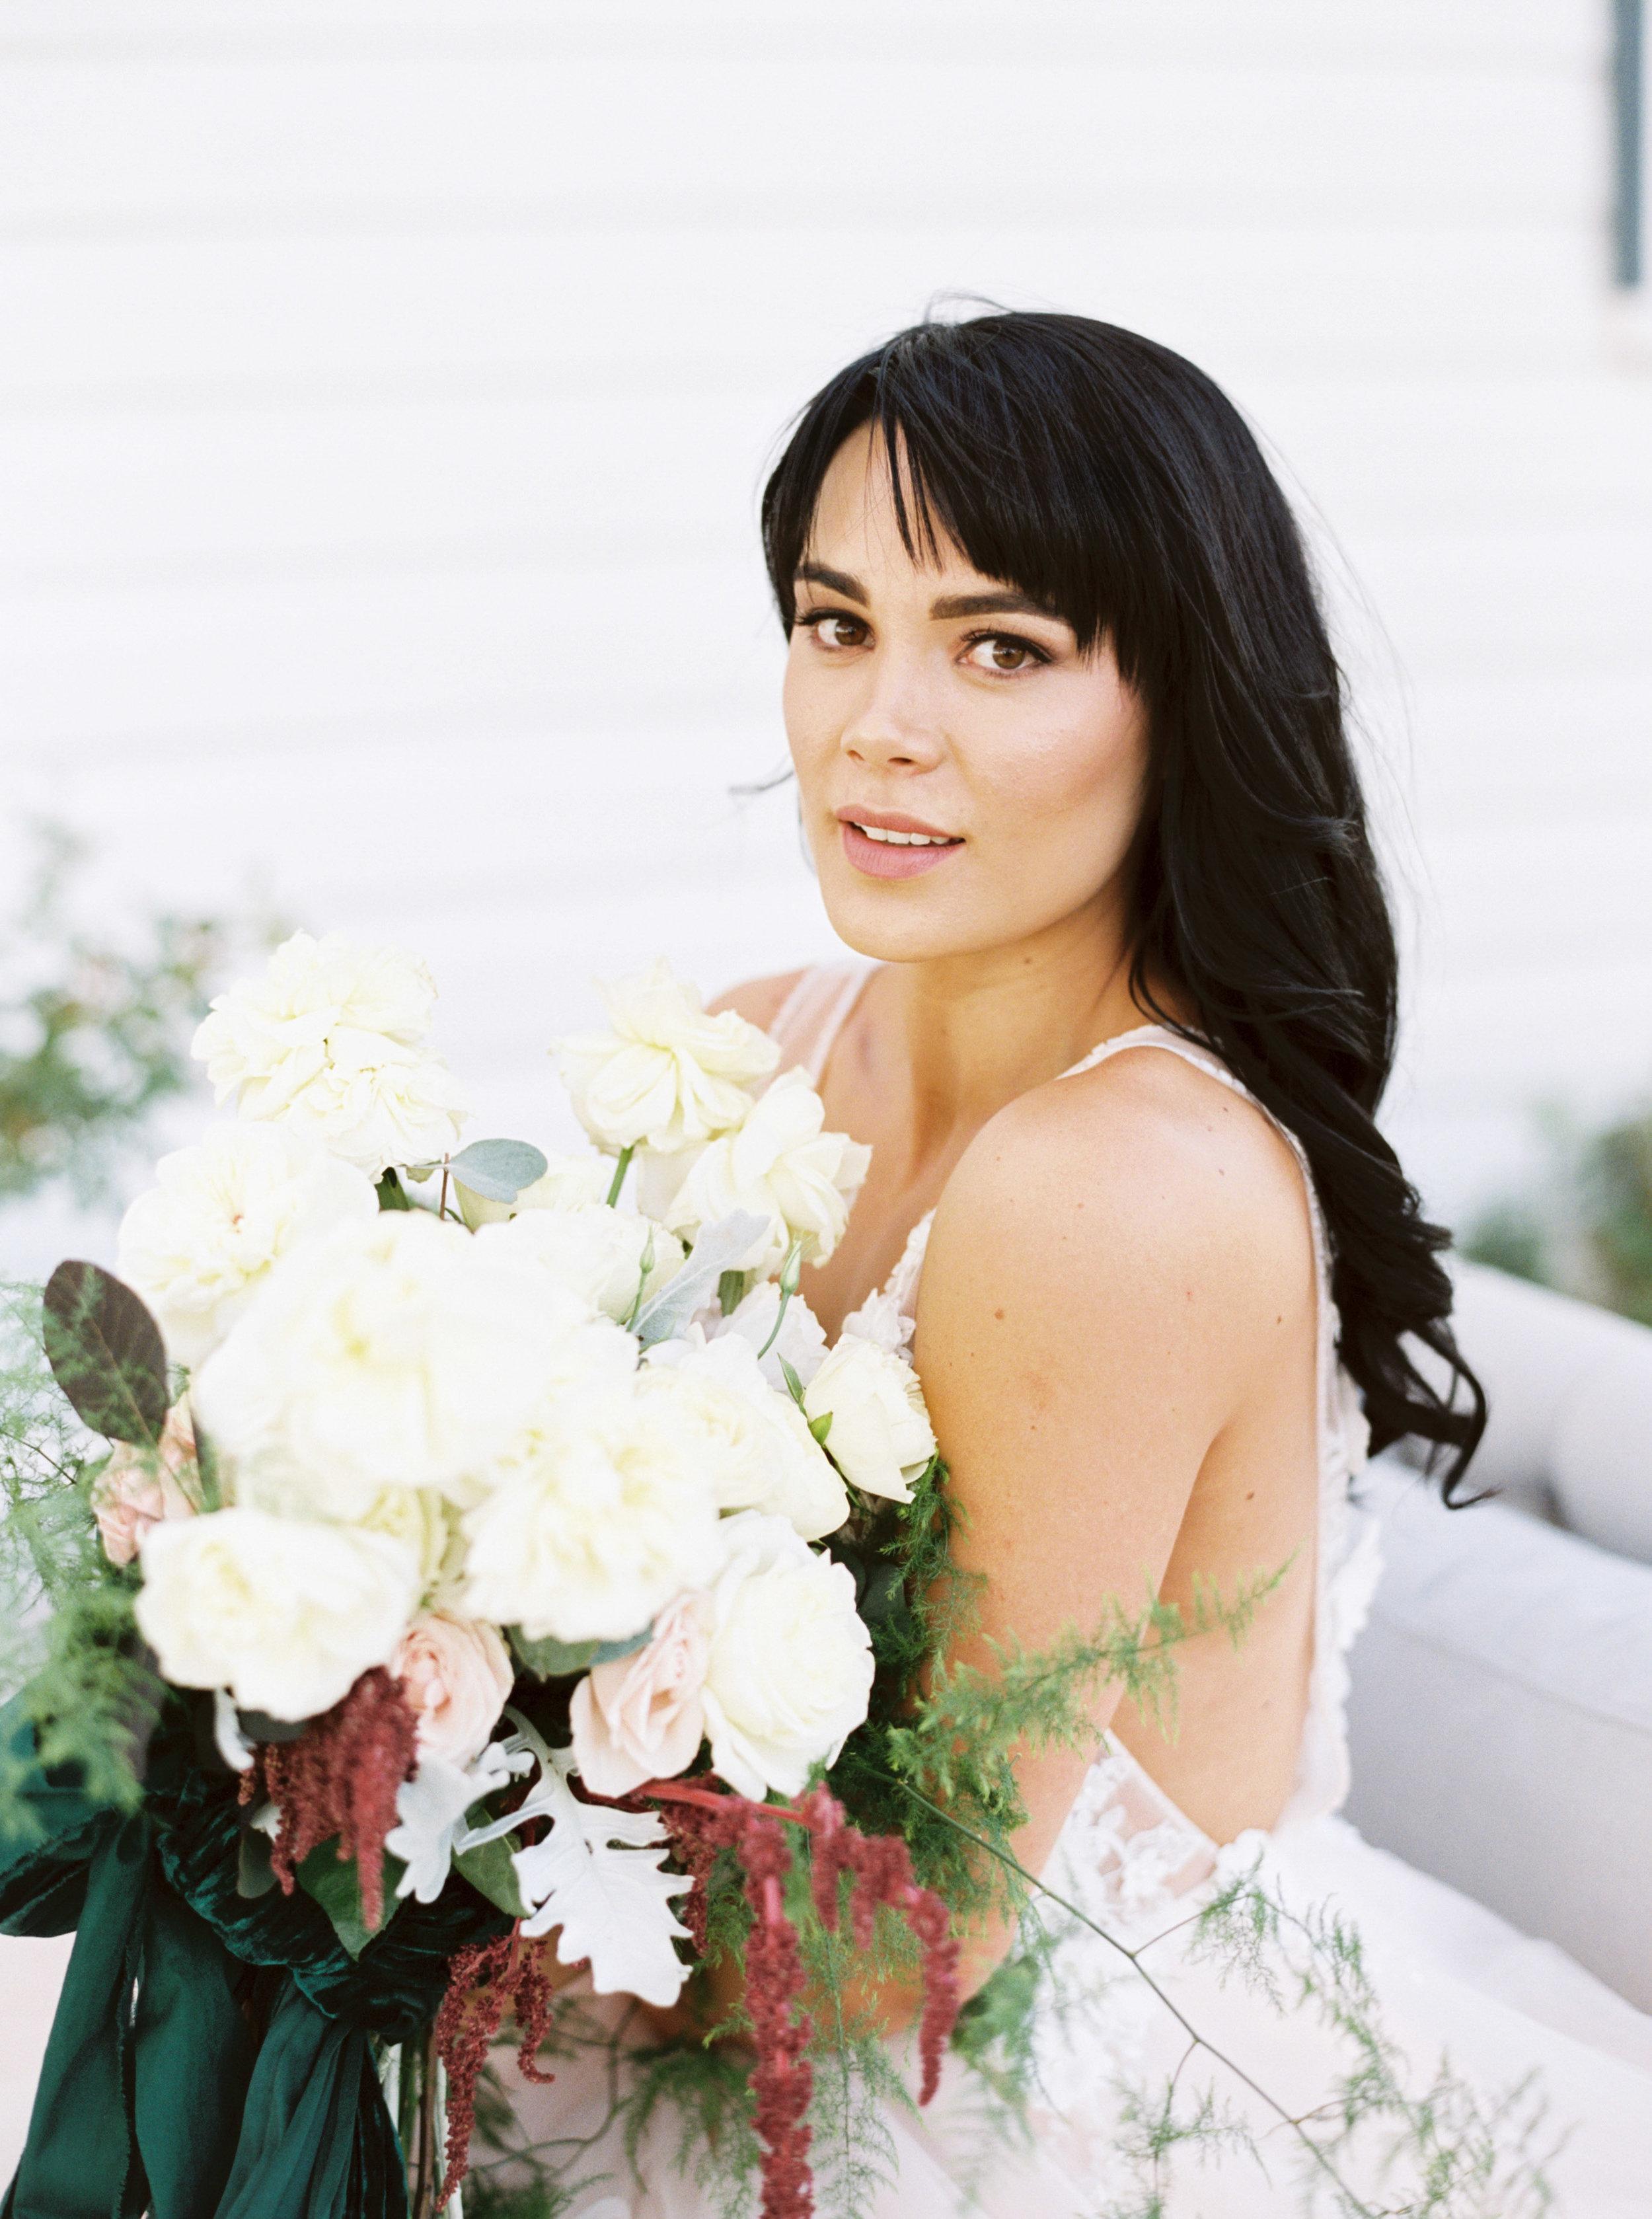 00028- Tamworth NSW Wedding Photographer Sheri McMahon-2.jpg